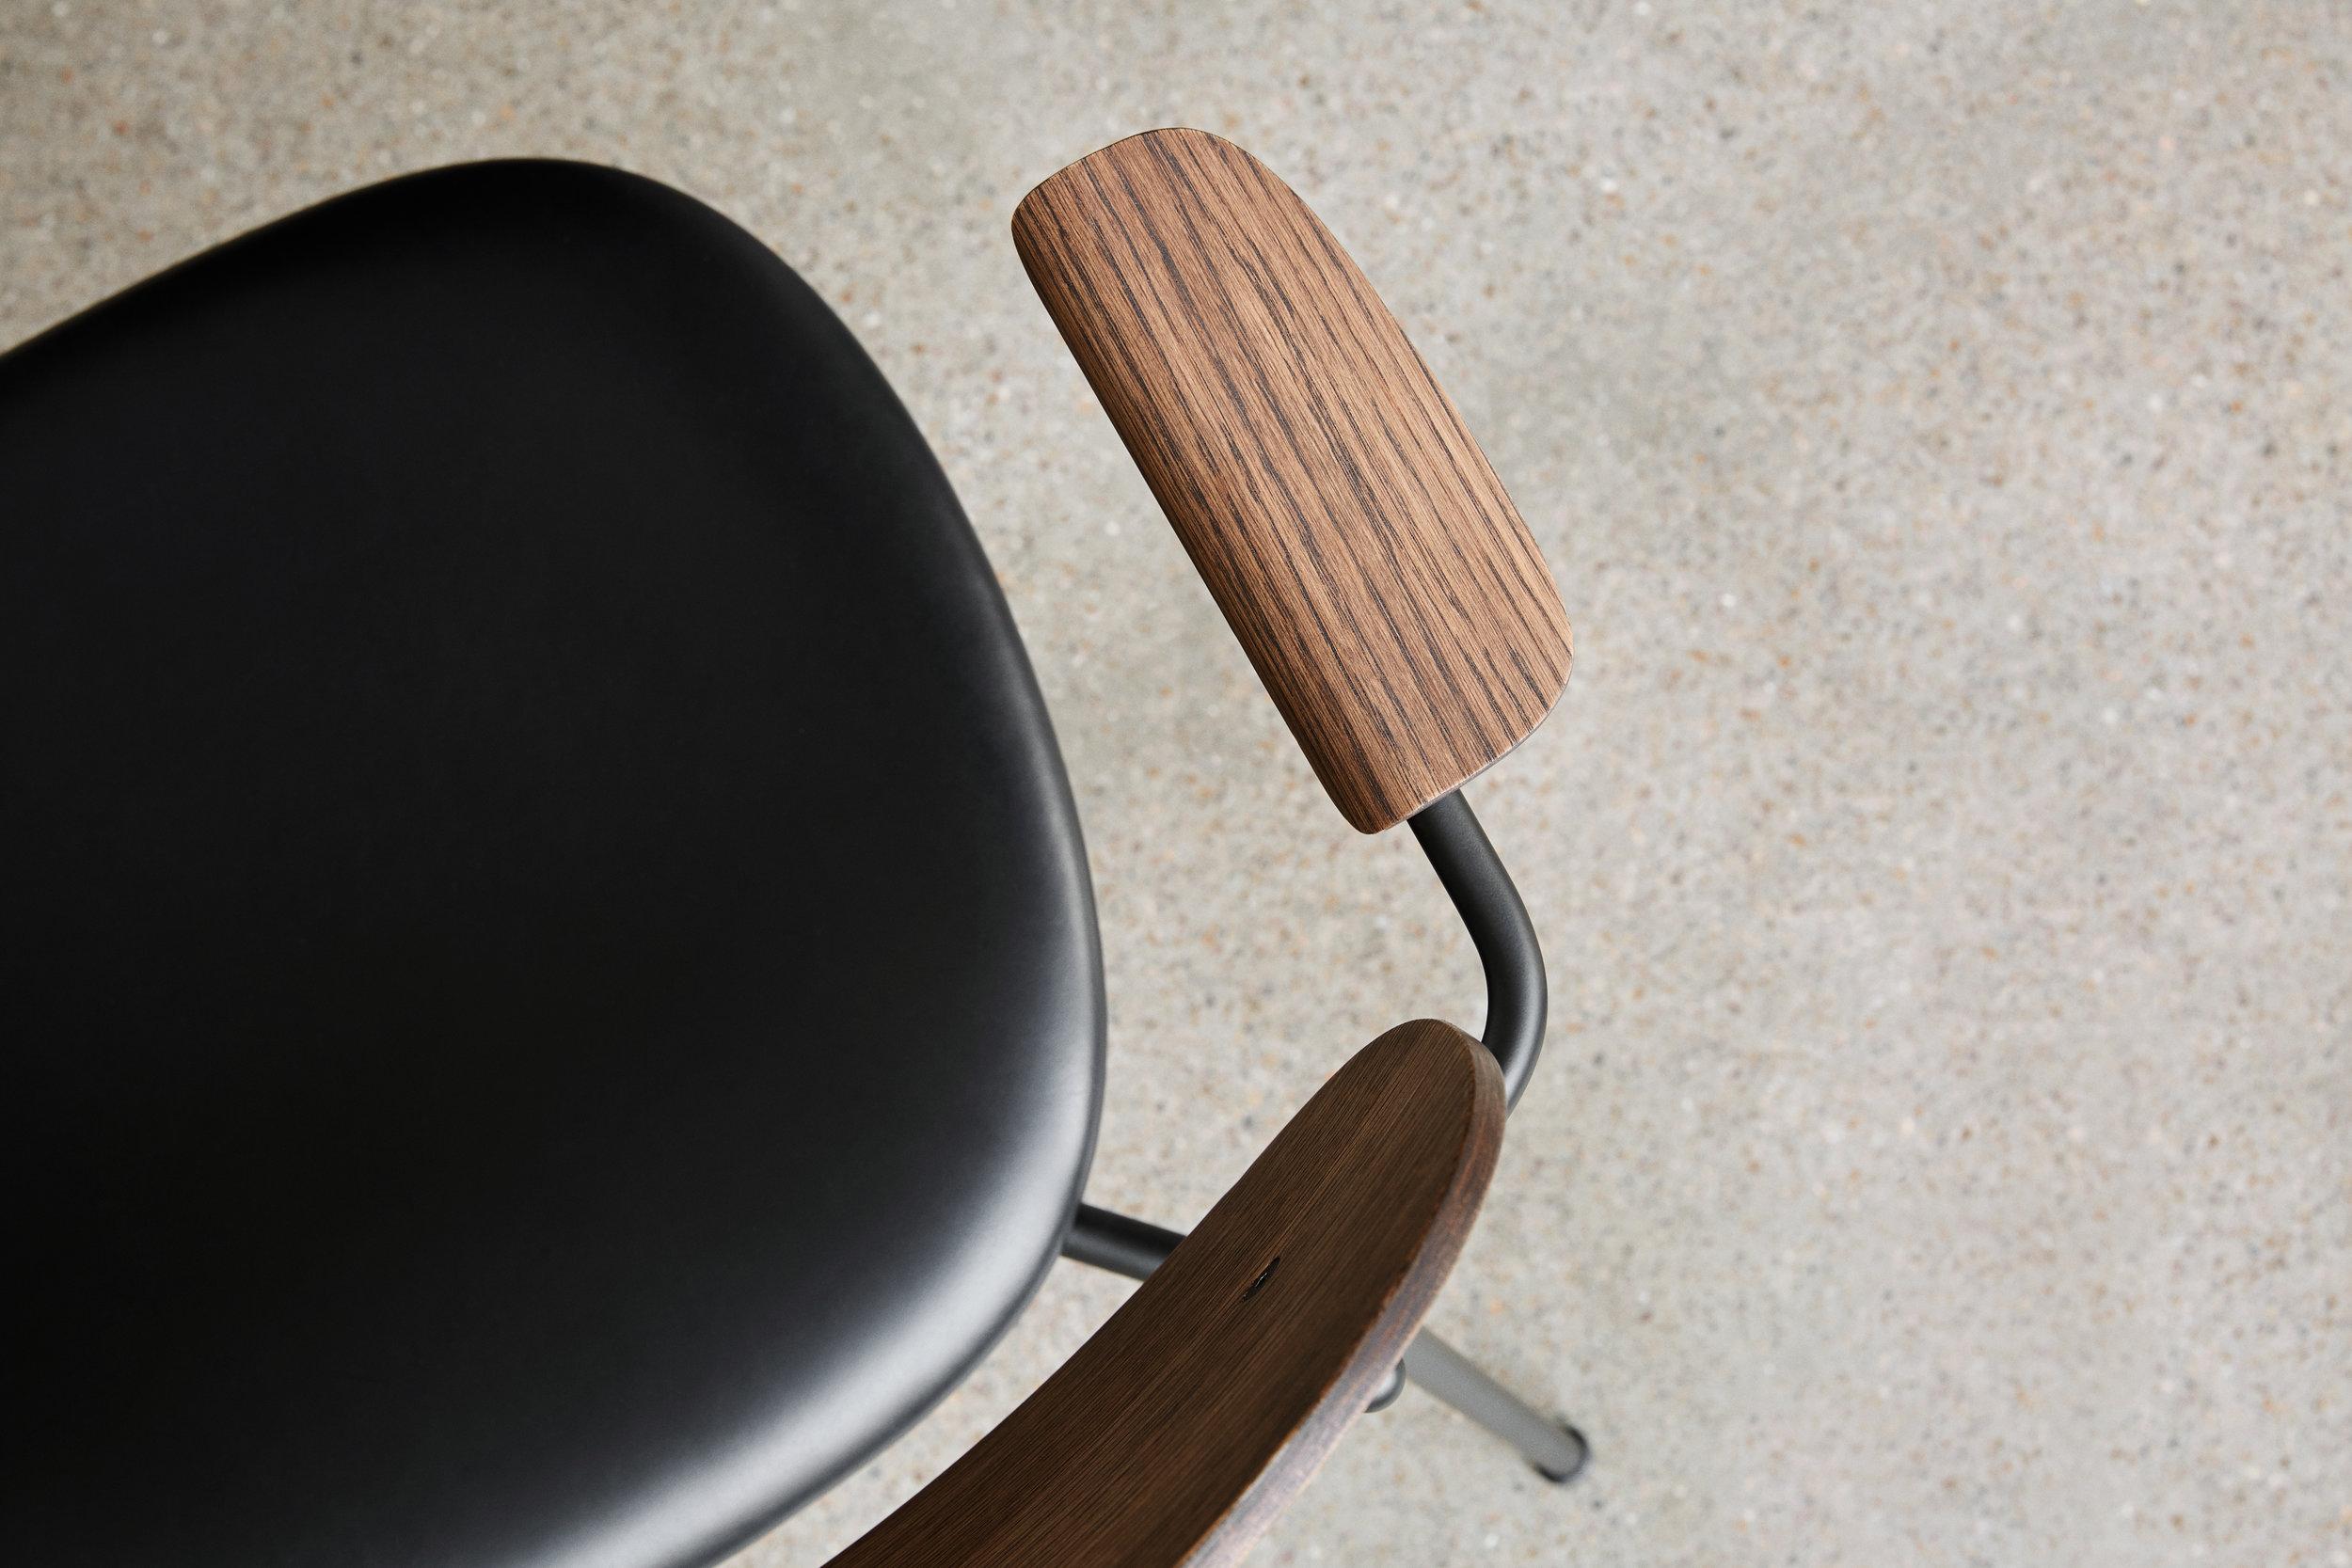 Co Chair The Lab Menu, modern furniture, chair, scandinavian design, scandinavian home 4.jpg